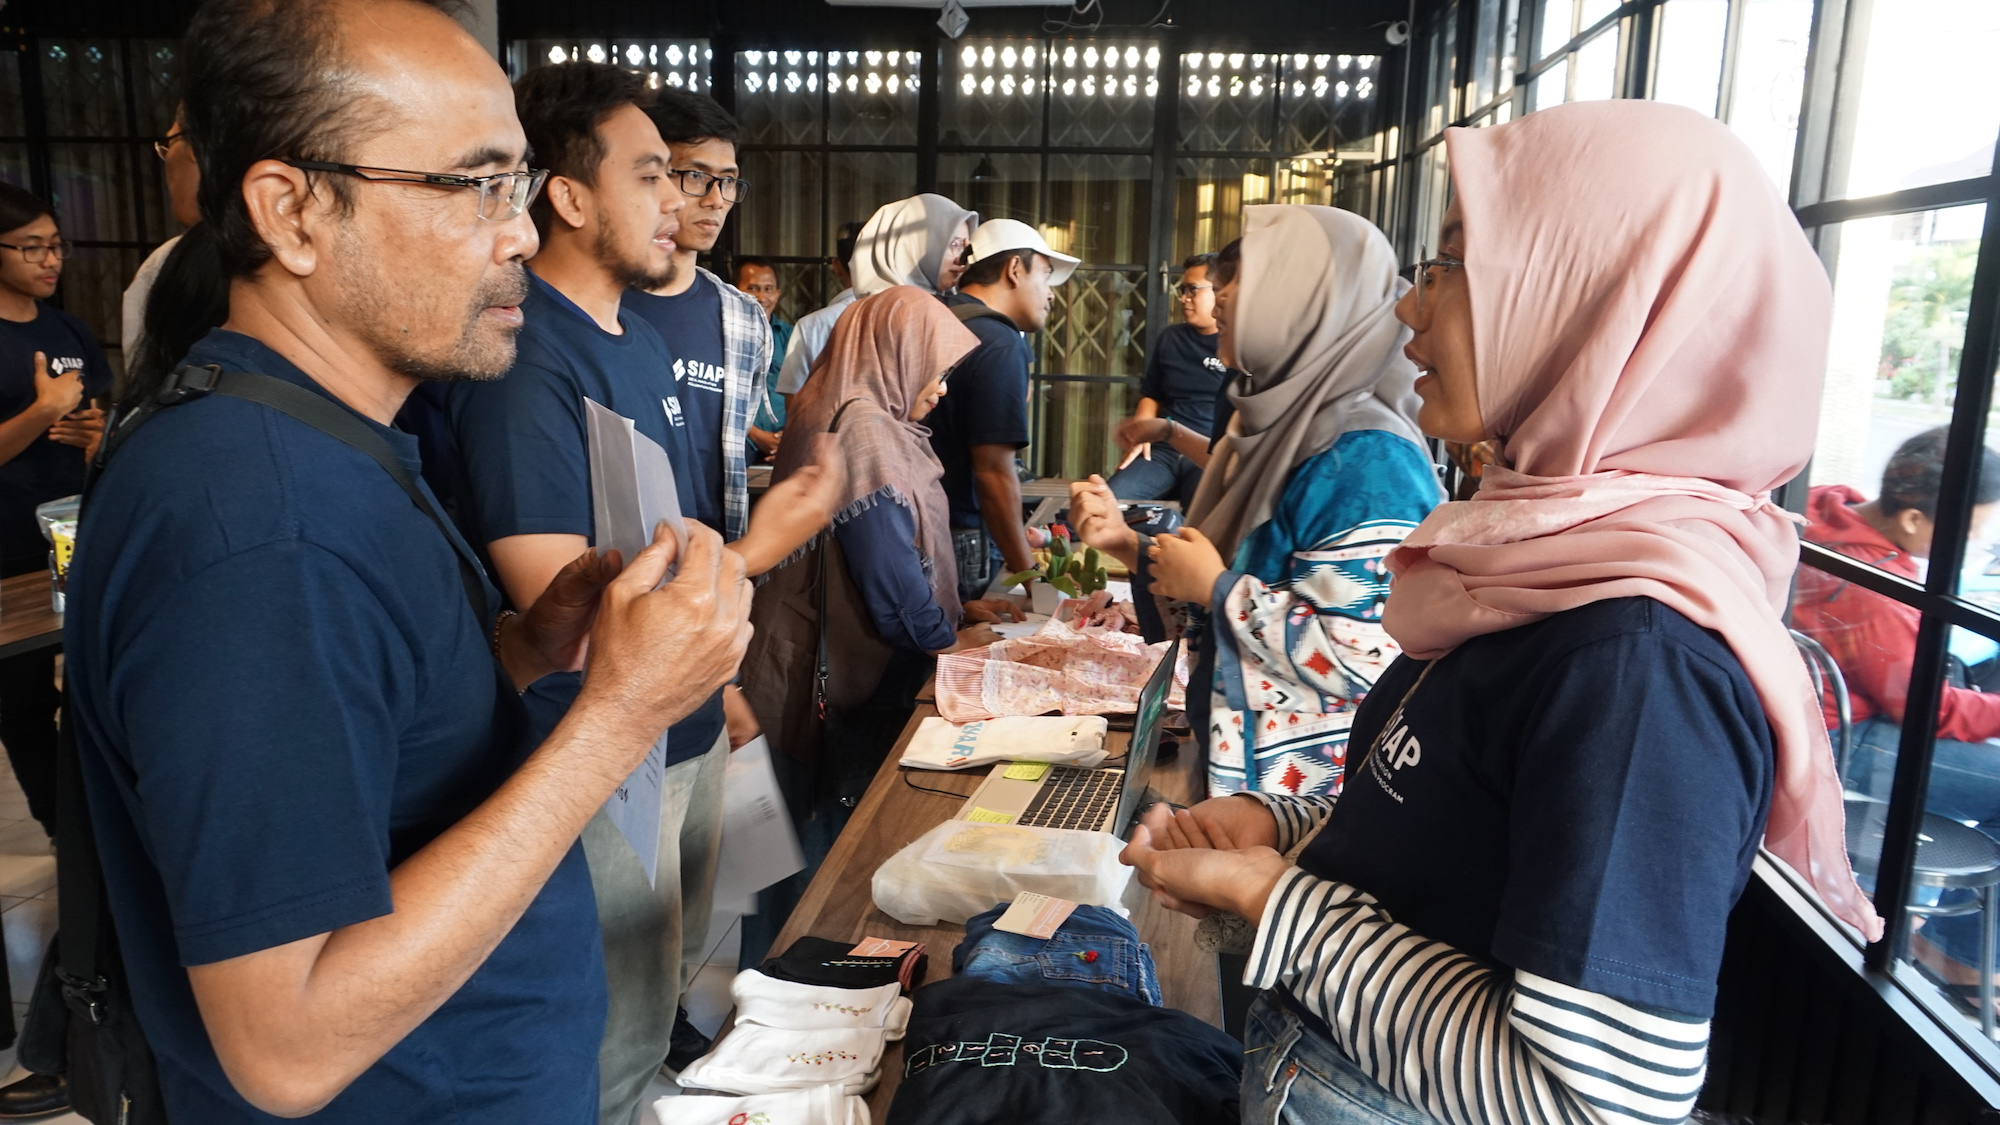 SIAP Indonesia - Bootcamp roadshow presentation day